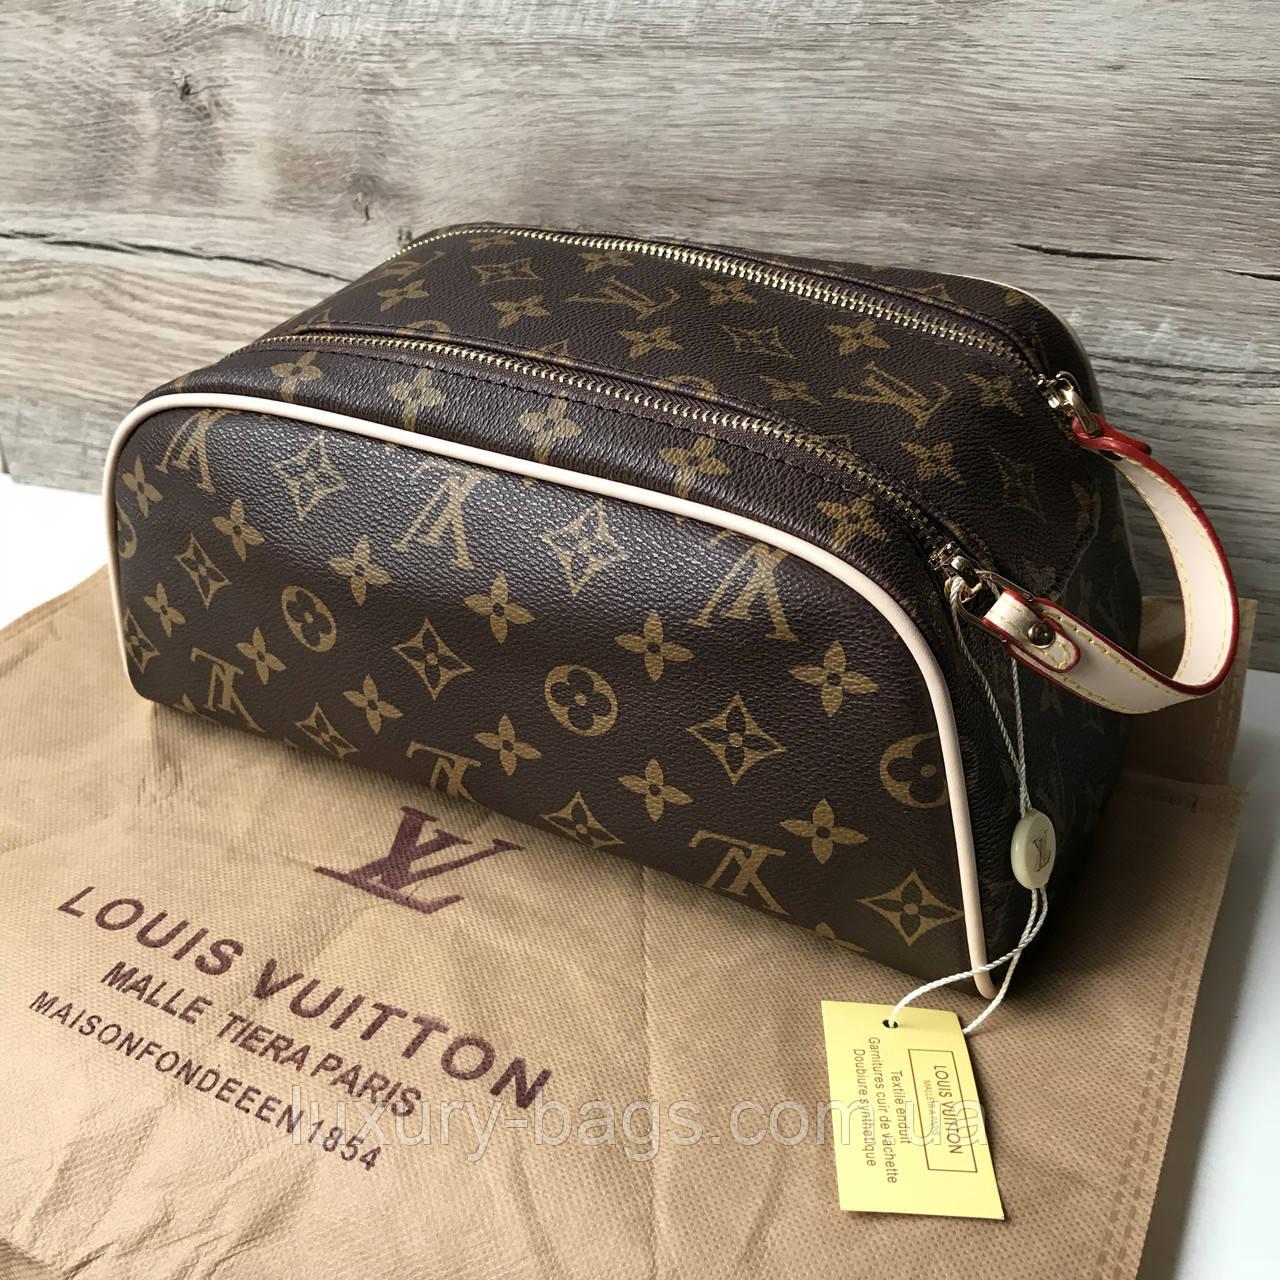 3b11192b3df3 Женская косметичка сумочка Louis Vuitton Луи Виттон - BaGsInTrend в Одессе